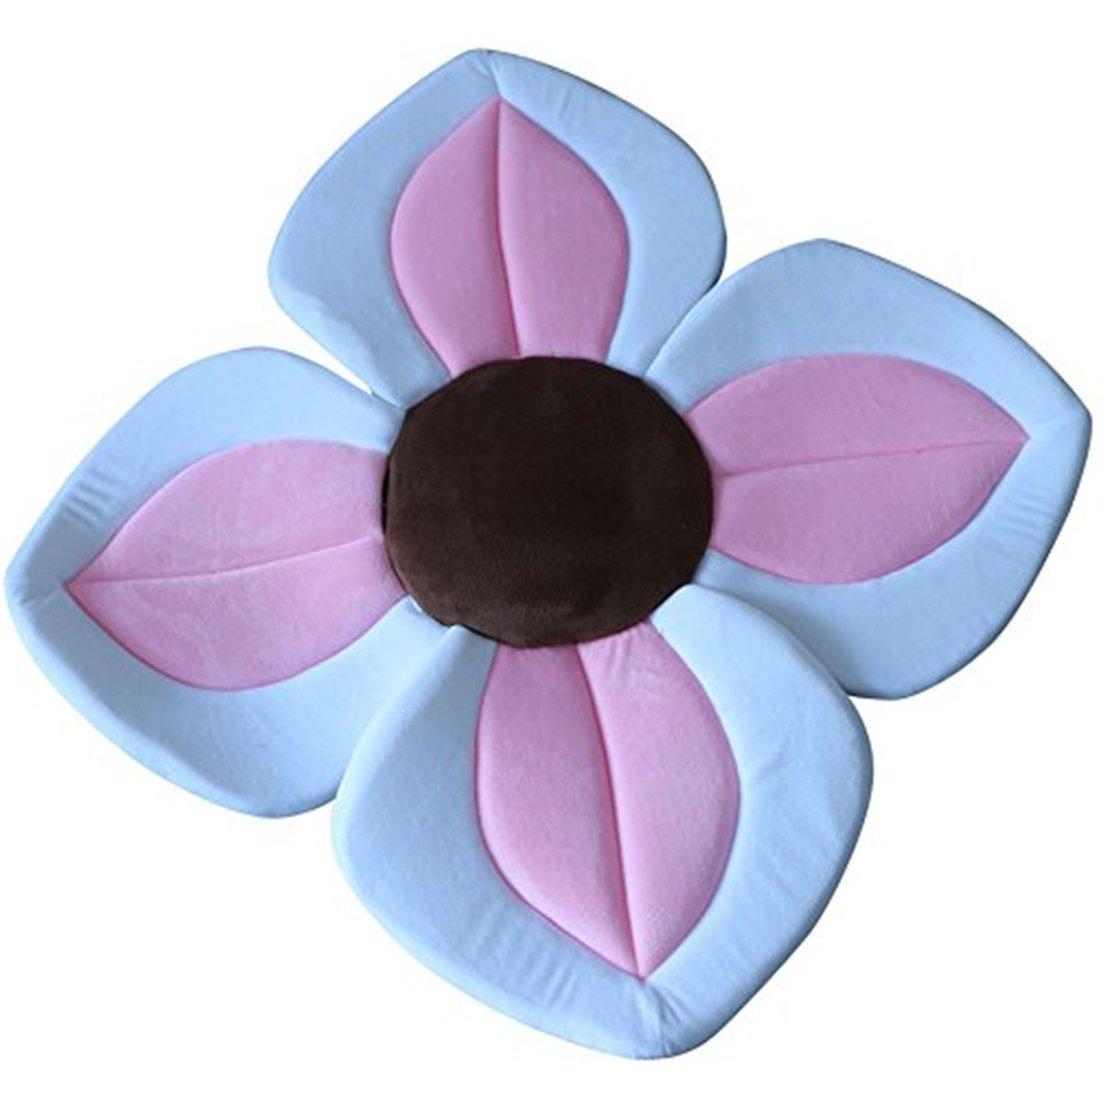 Amazon.com: Highpot New Lotus Blooming Flower Bath Tub Blooming Sink ...